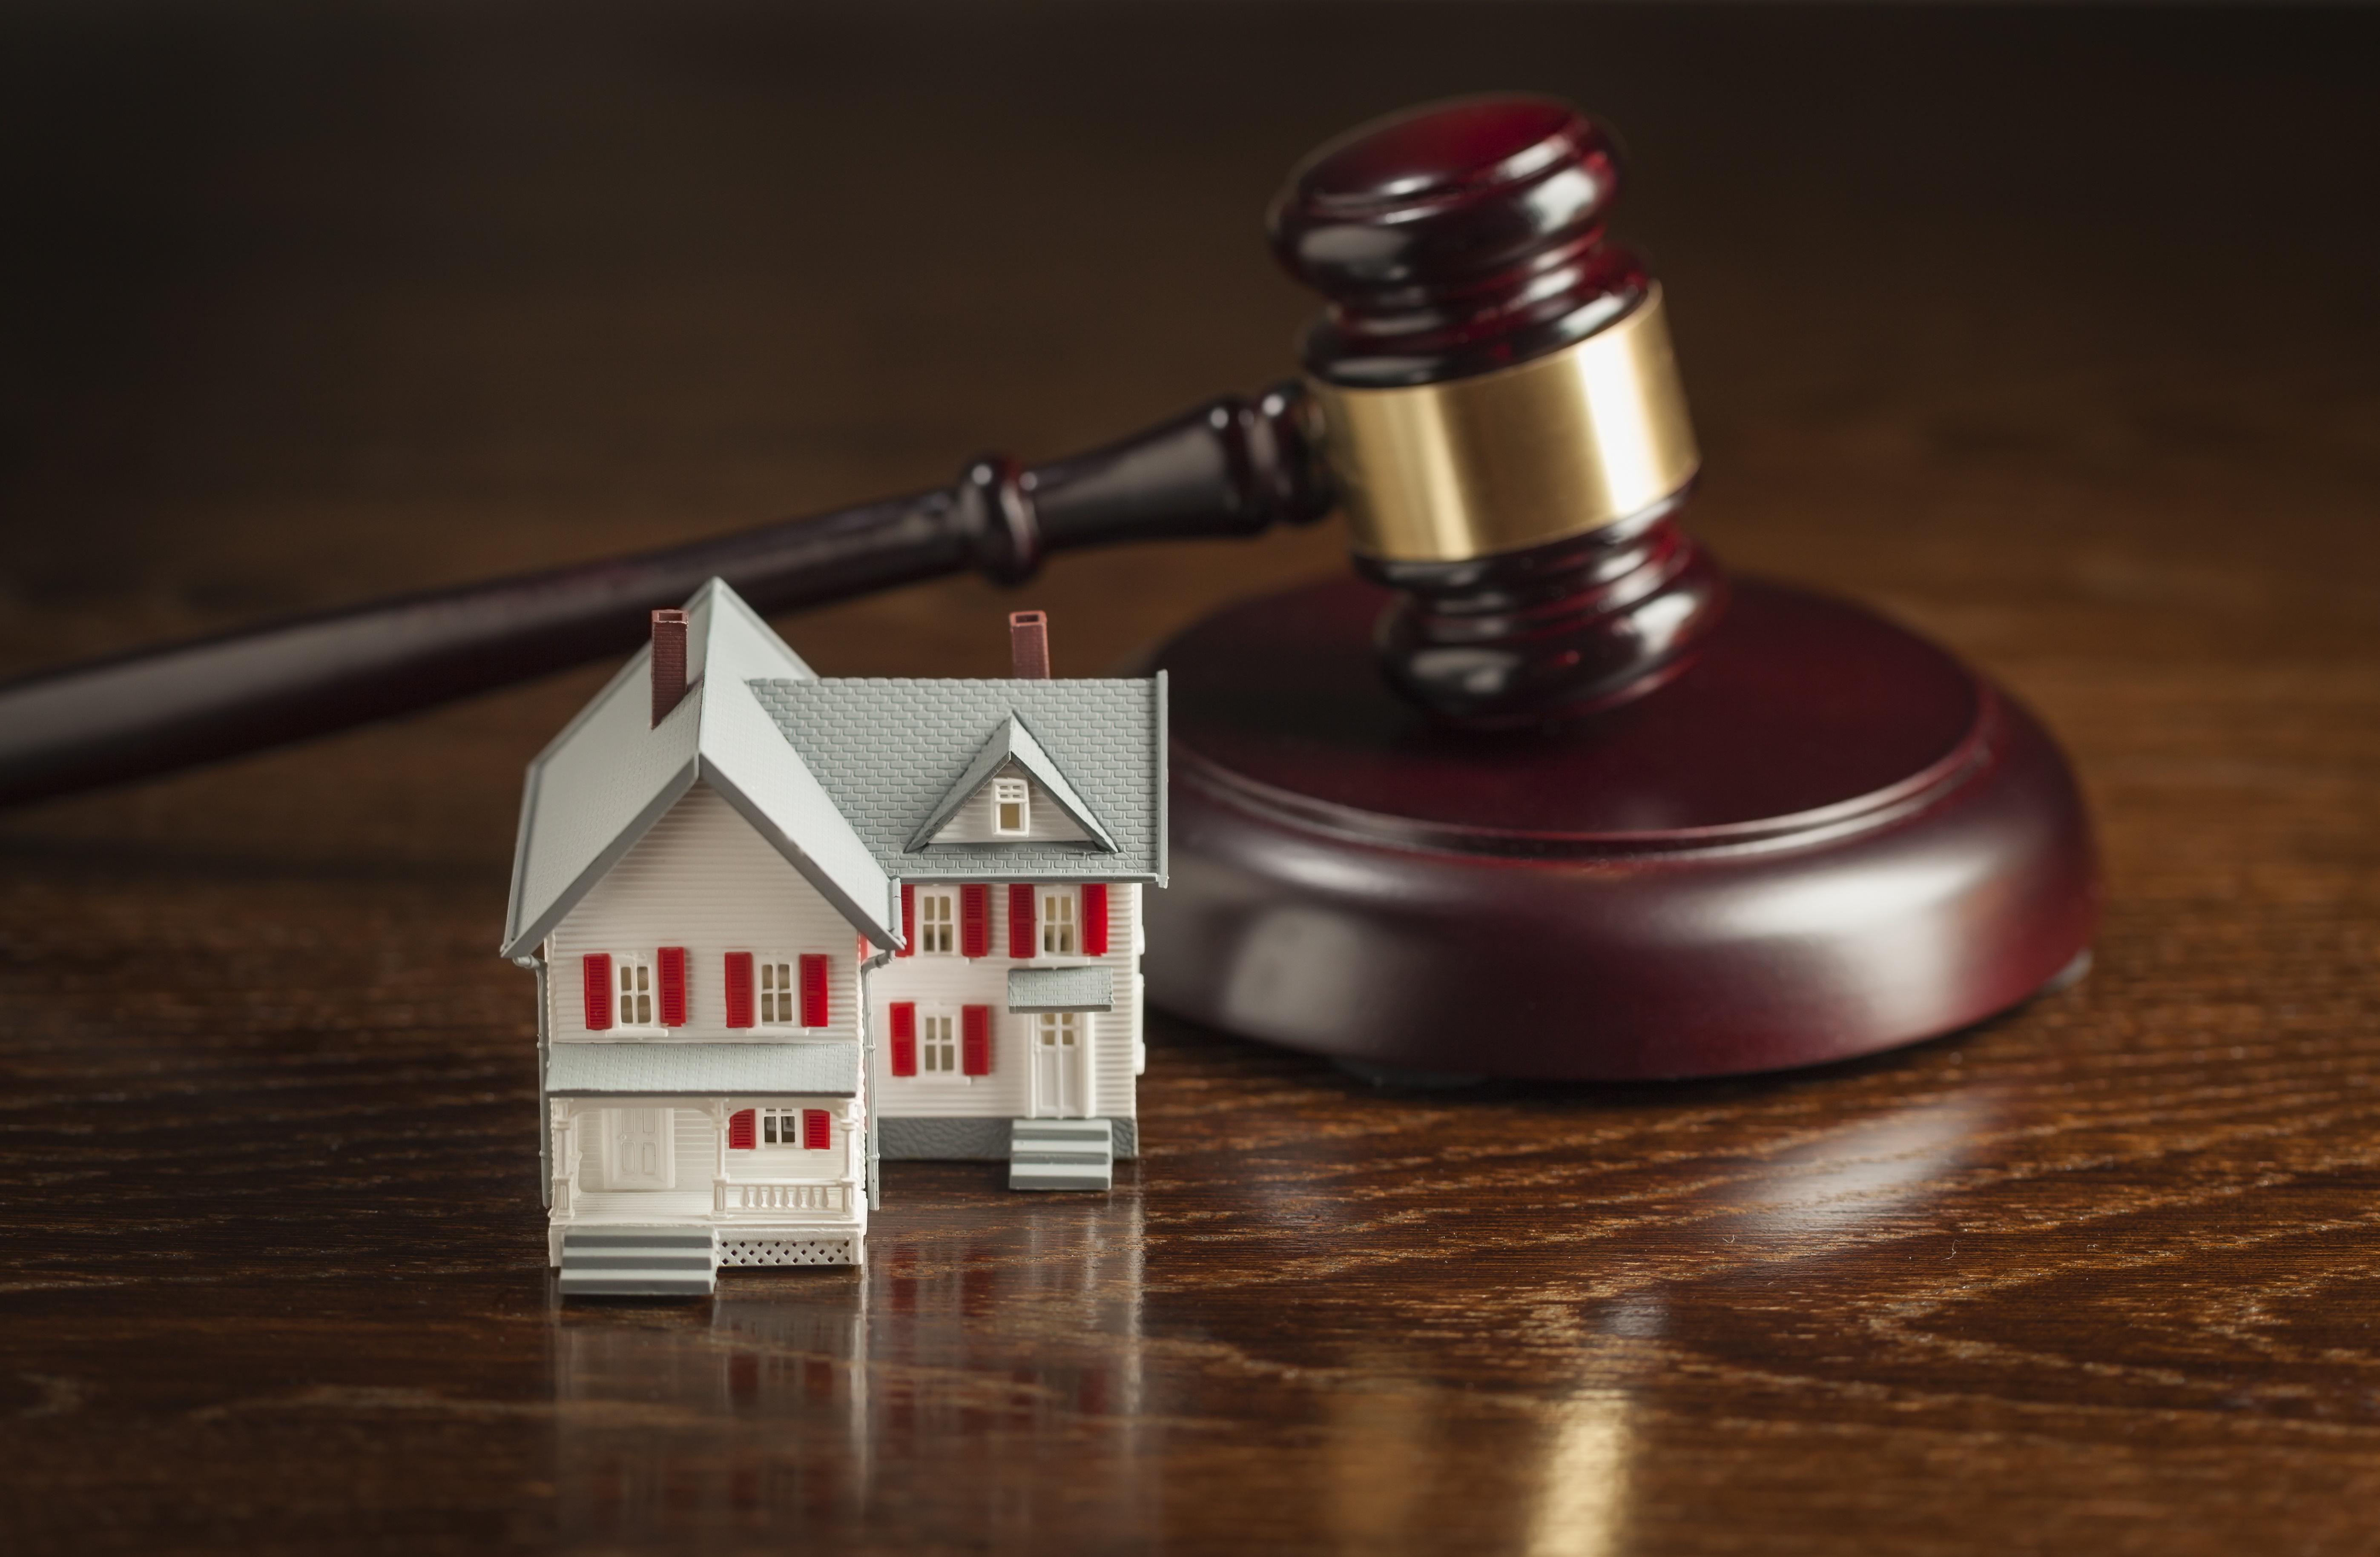 CIC tenant screening eviction history